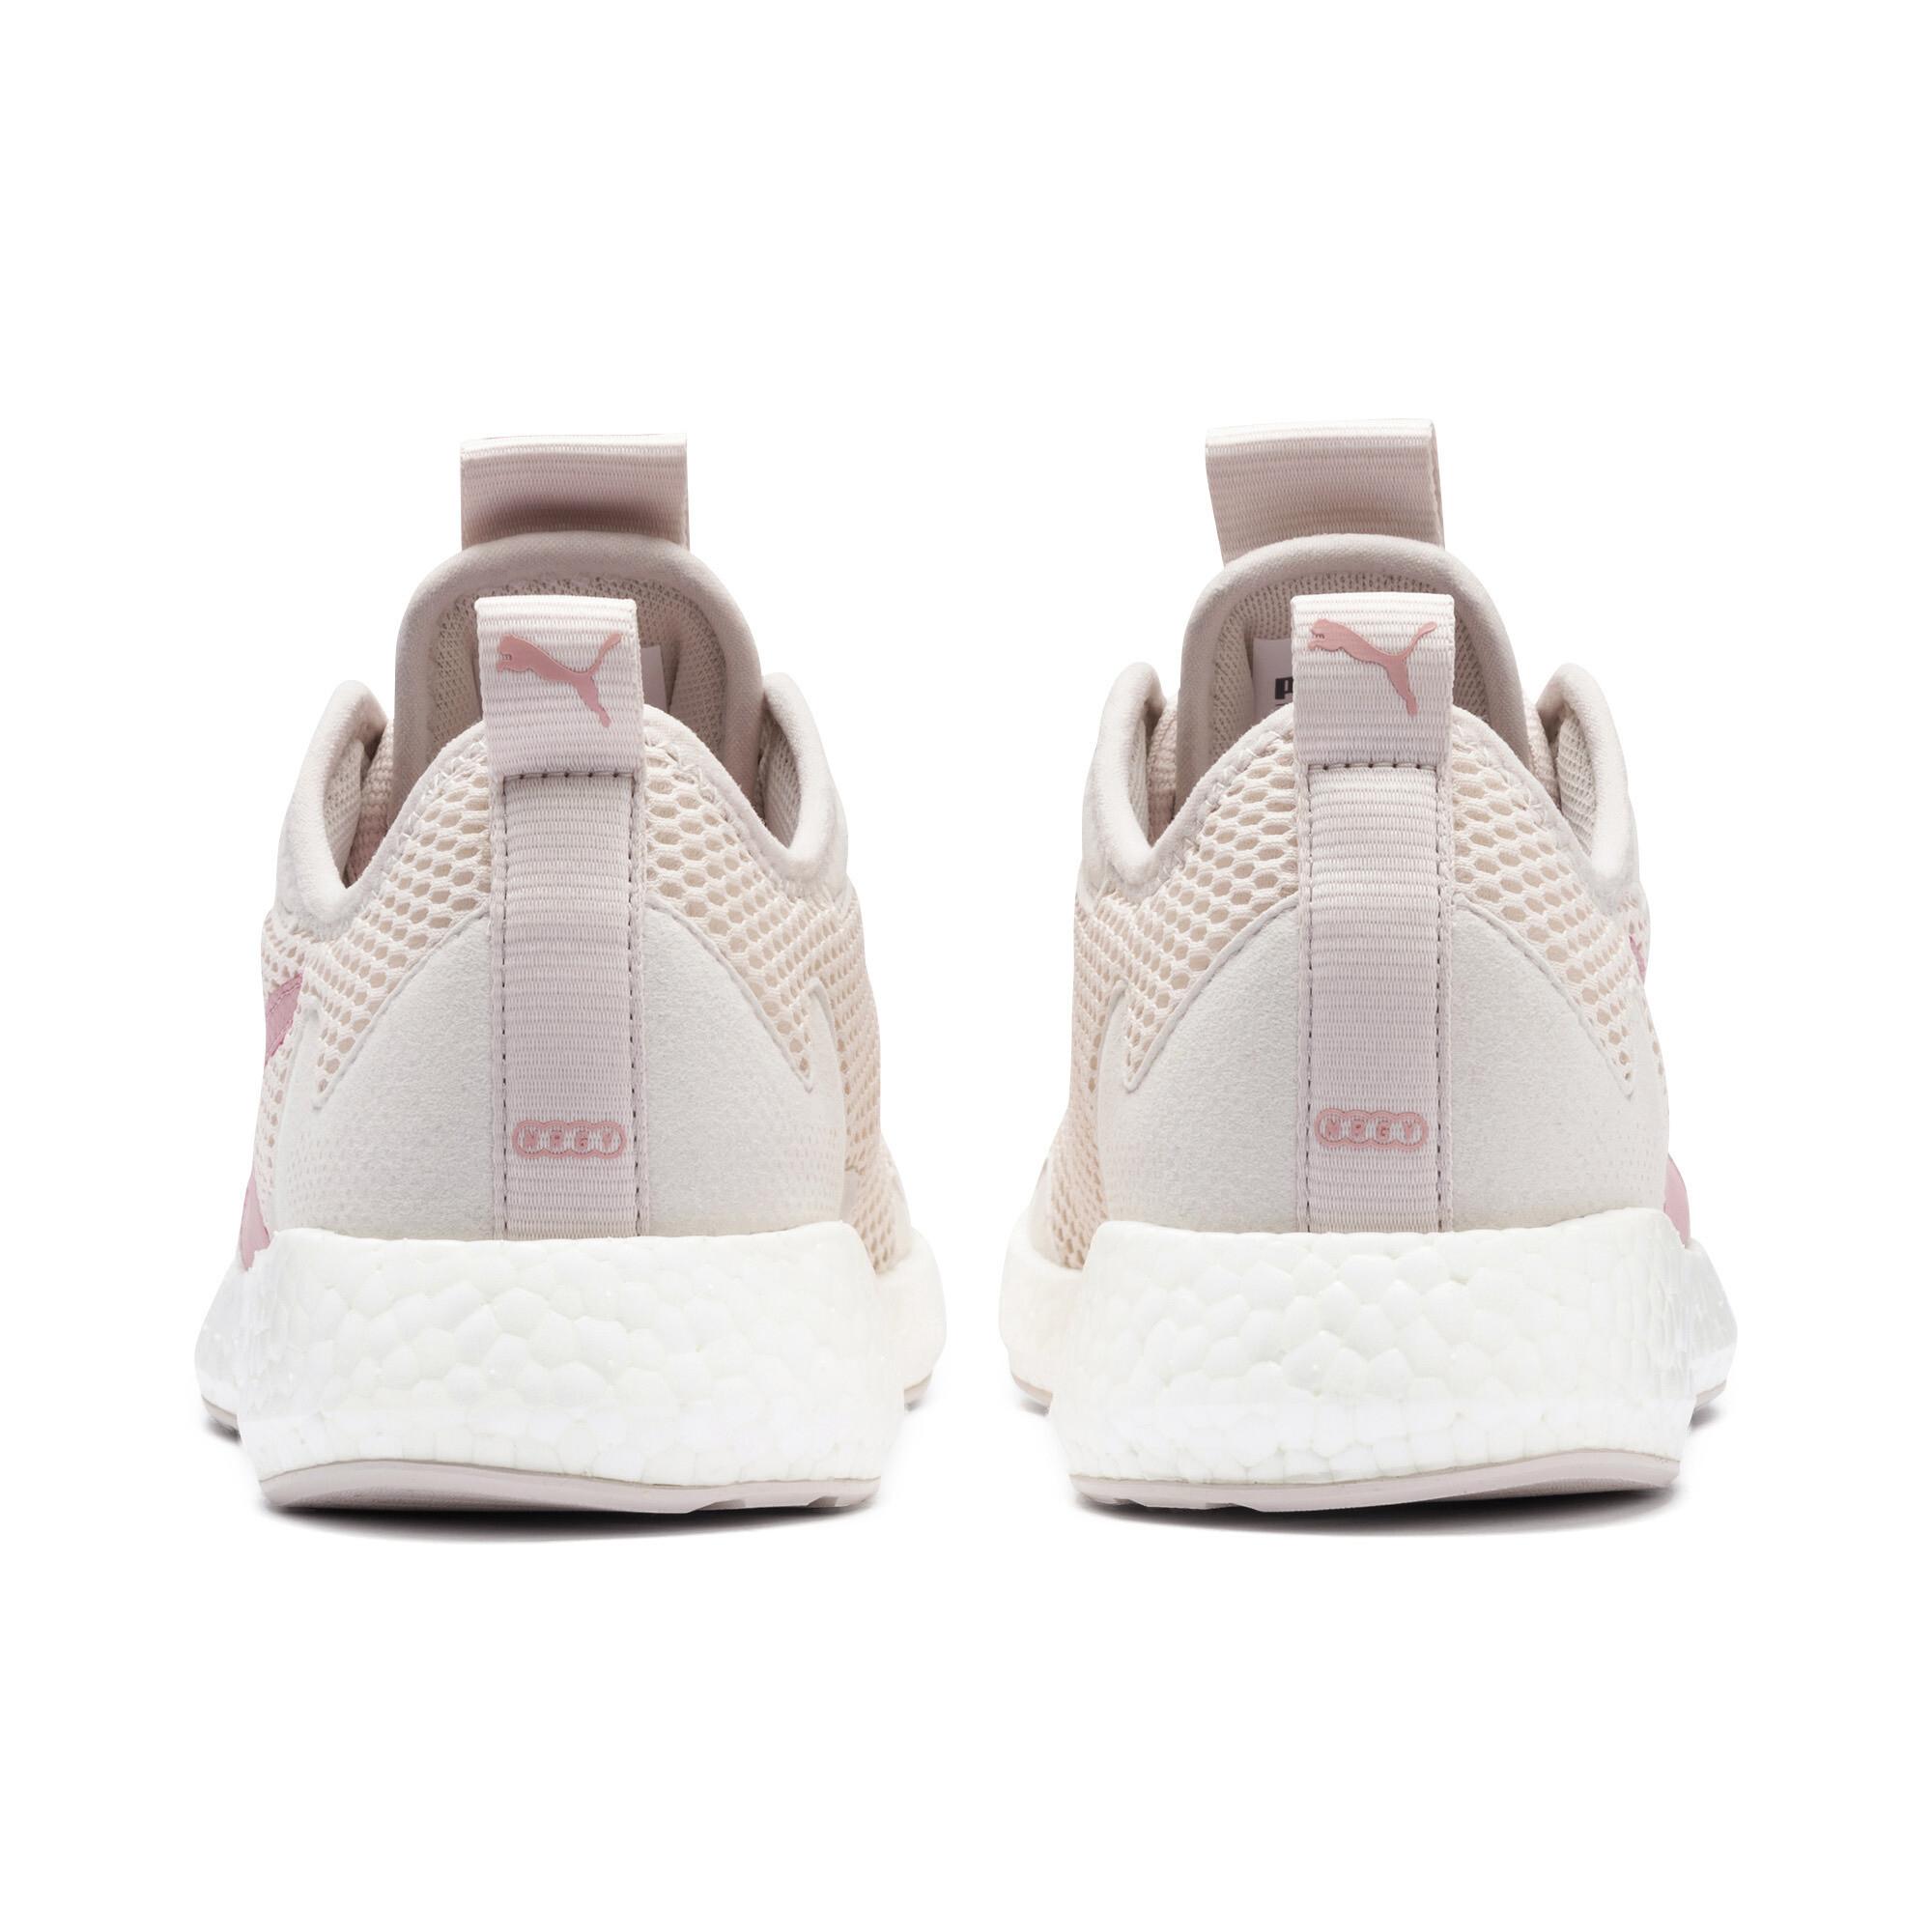 PUMA-Women-039-s-NRGY-Neko-Skim-Running-Shoes thumbnail 17